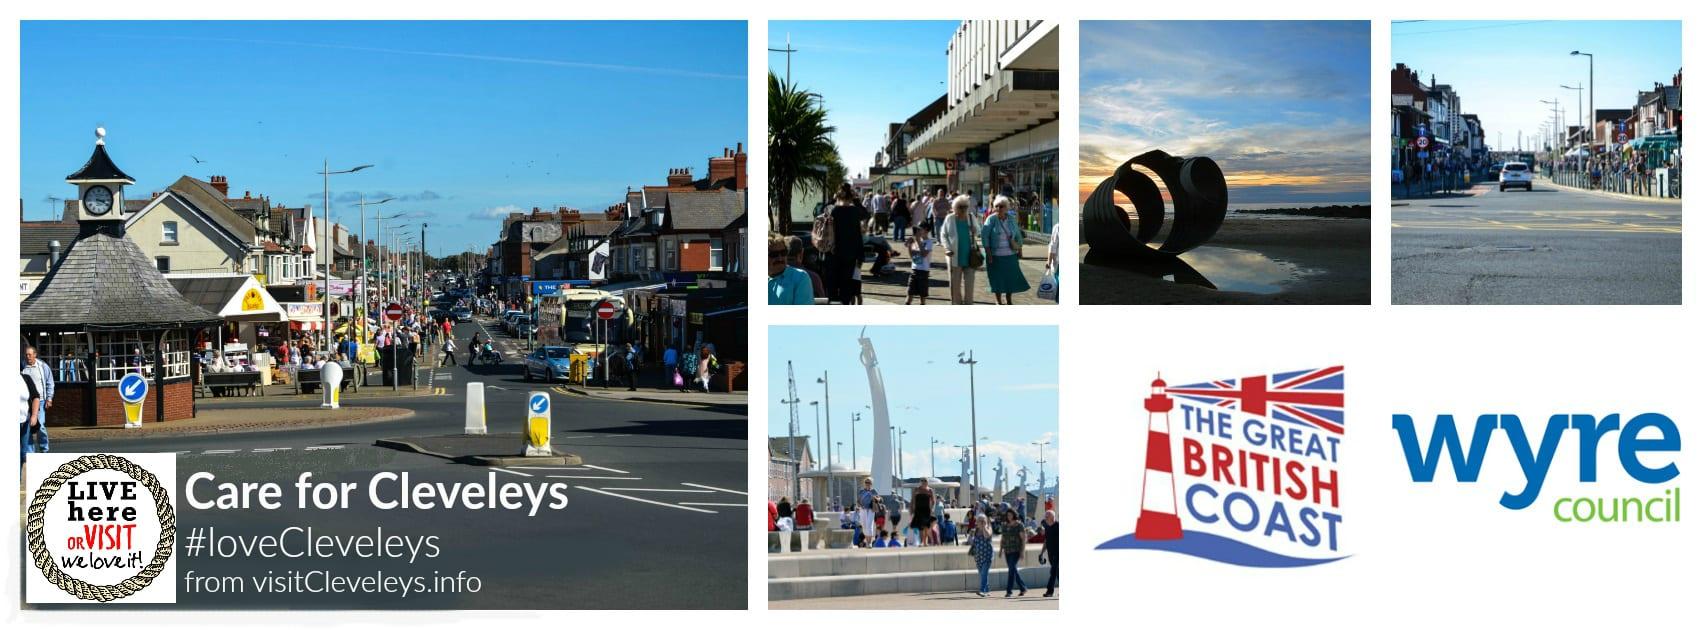 Care for Cleveleys. Cleveleys Coastal Community Team updates